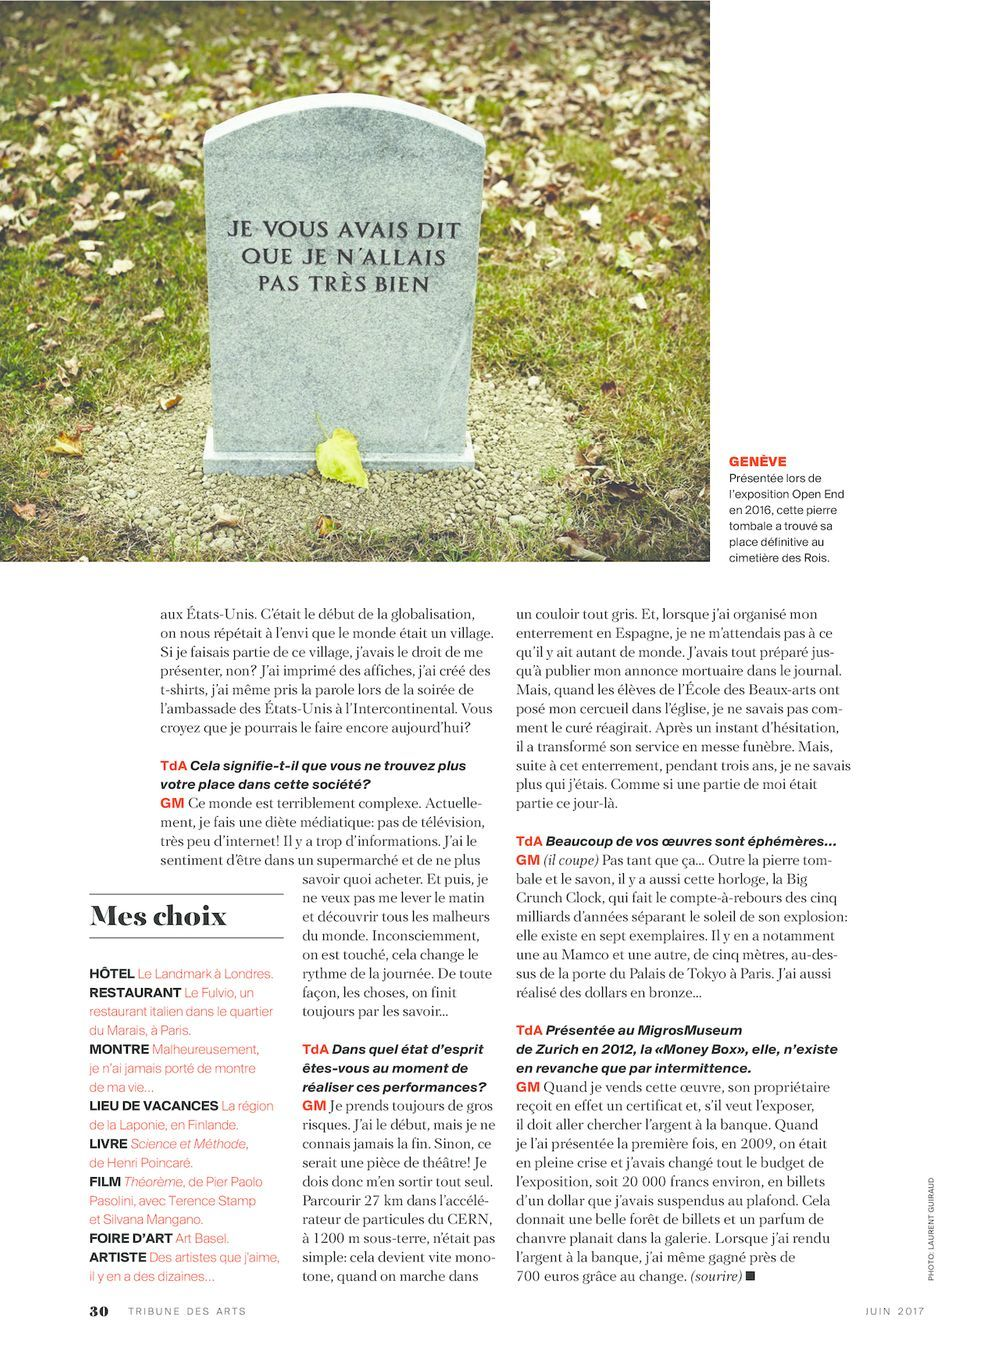 La Tribune des arts | Gianni MOTTI